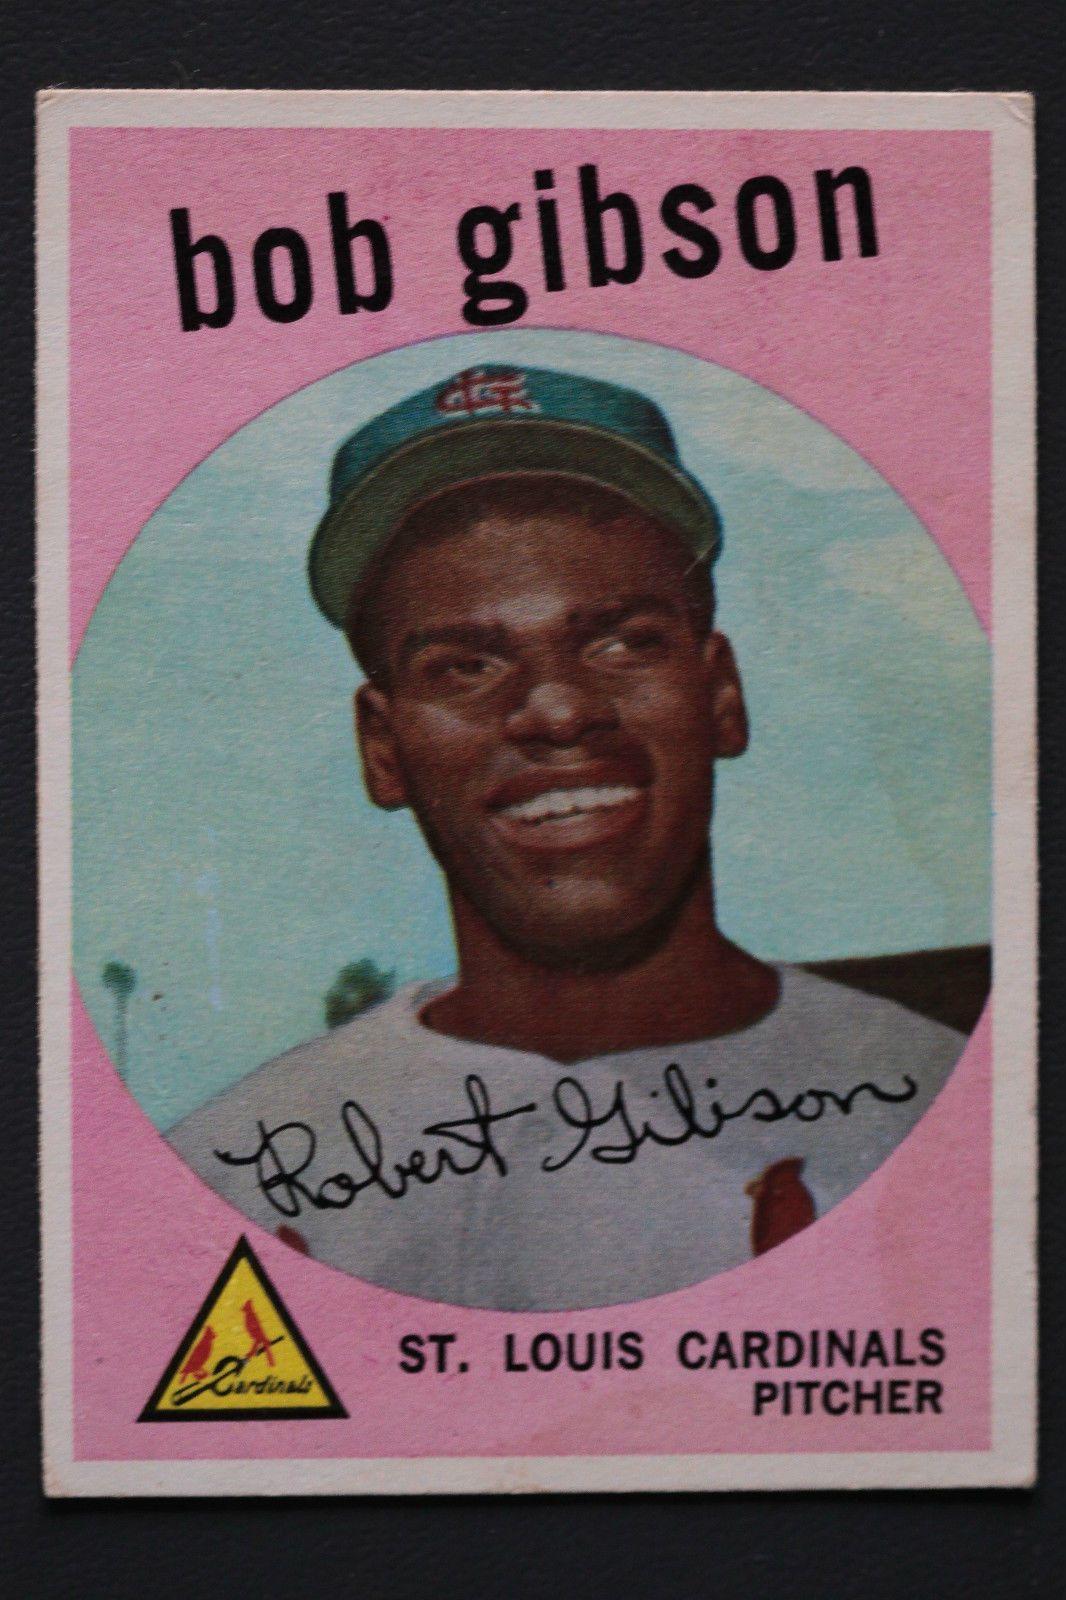 1959 TOPPS Baseball card values, Baseball